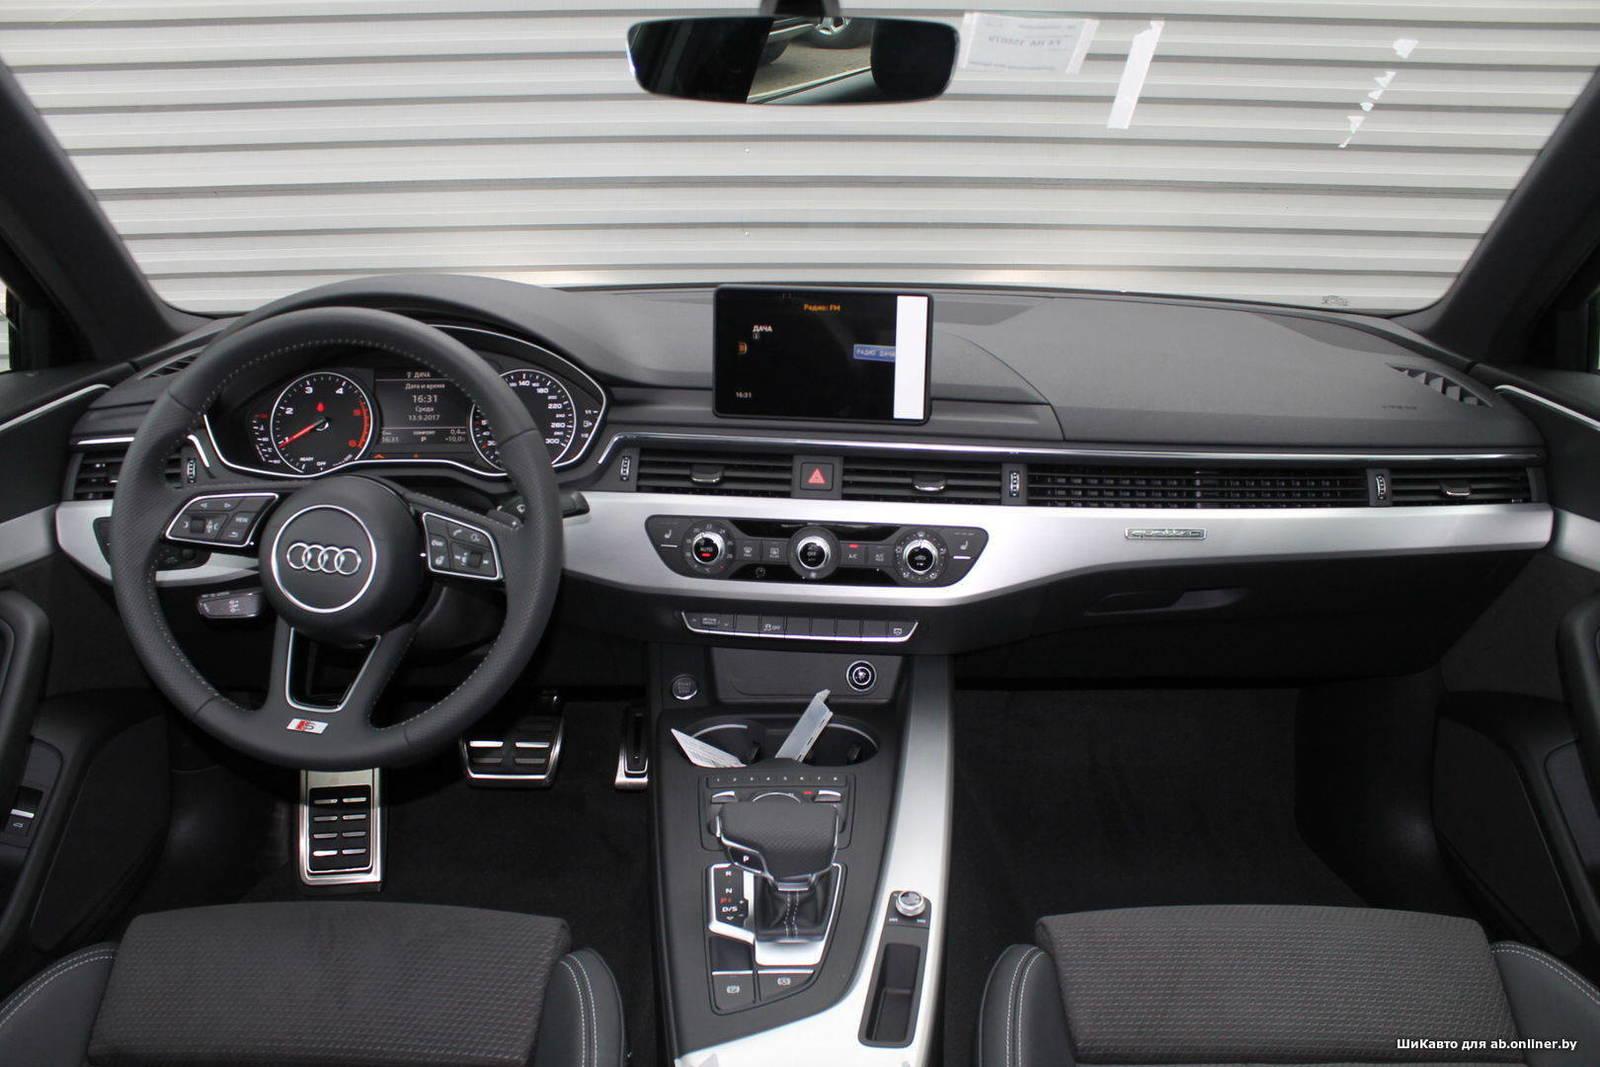 Audi A4 2.0TD S-tronic quattro